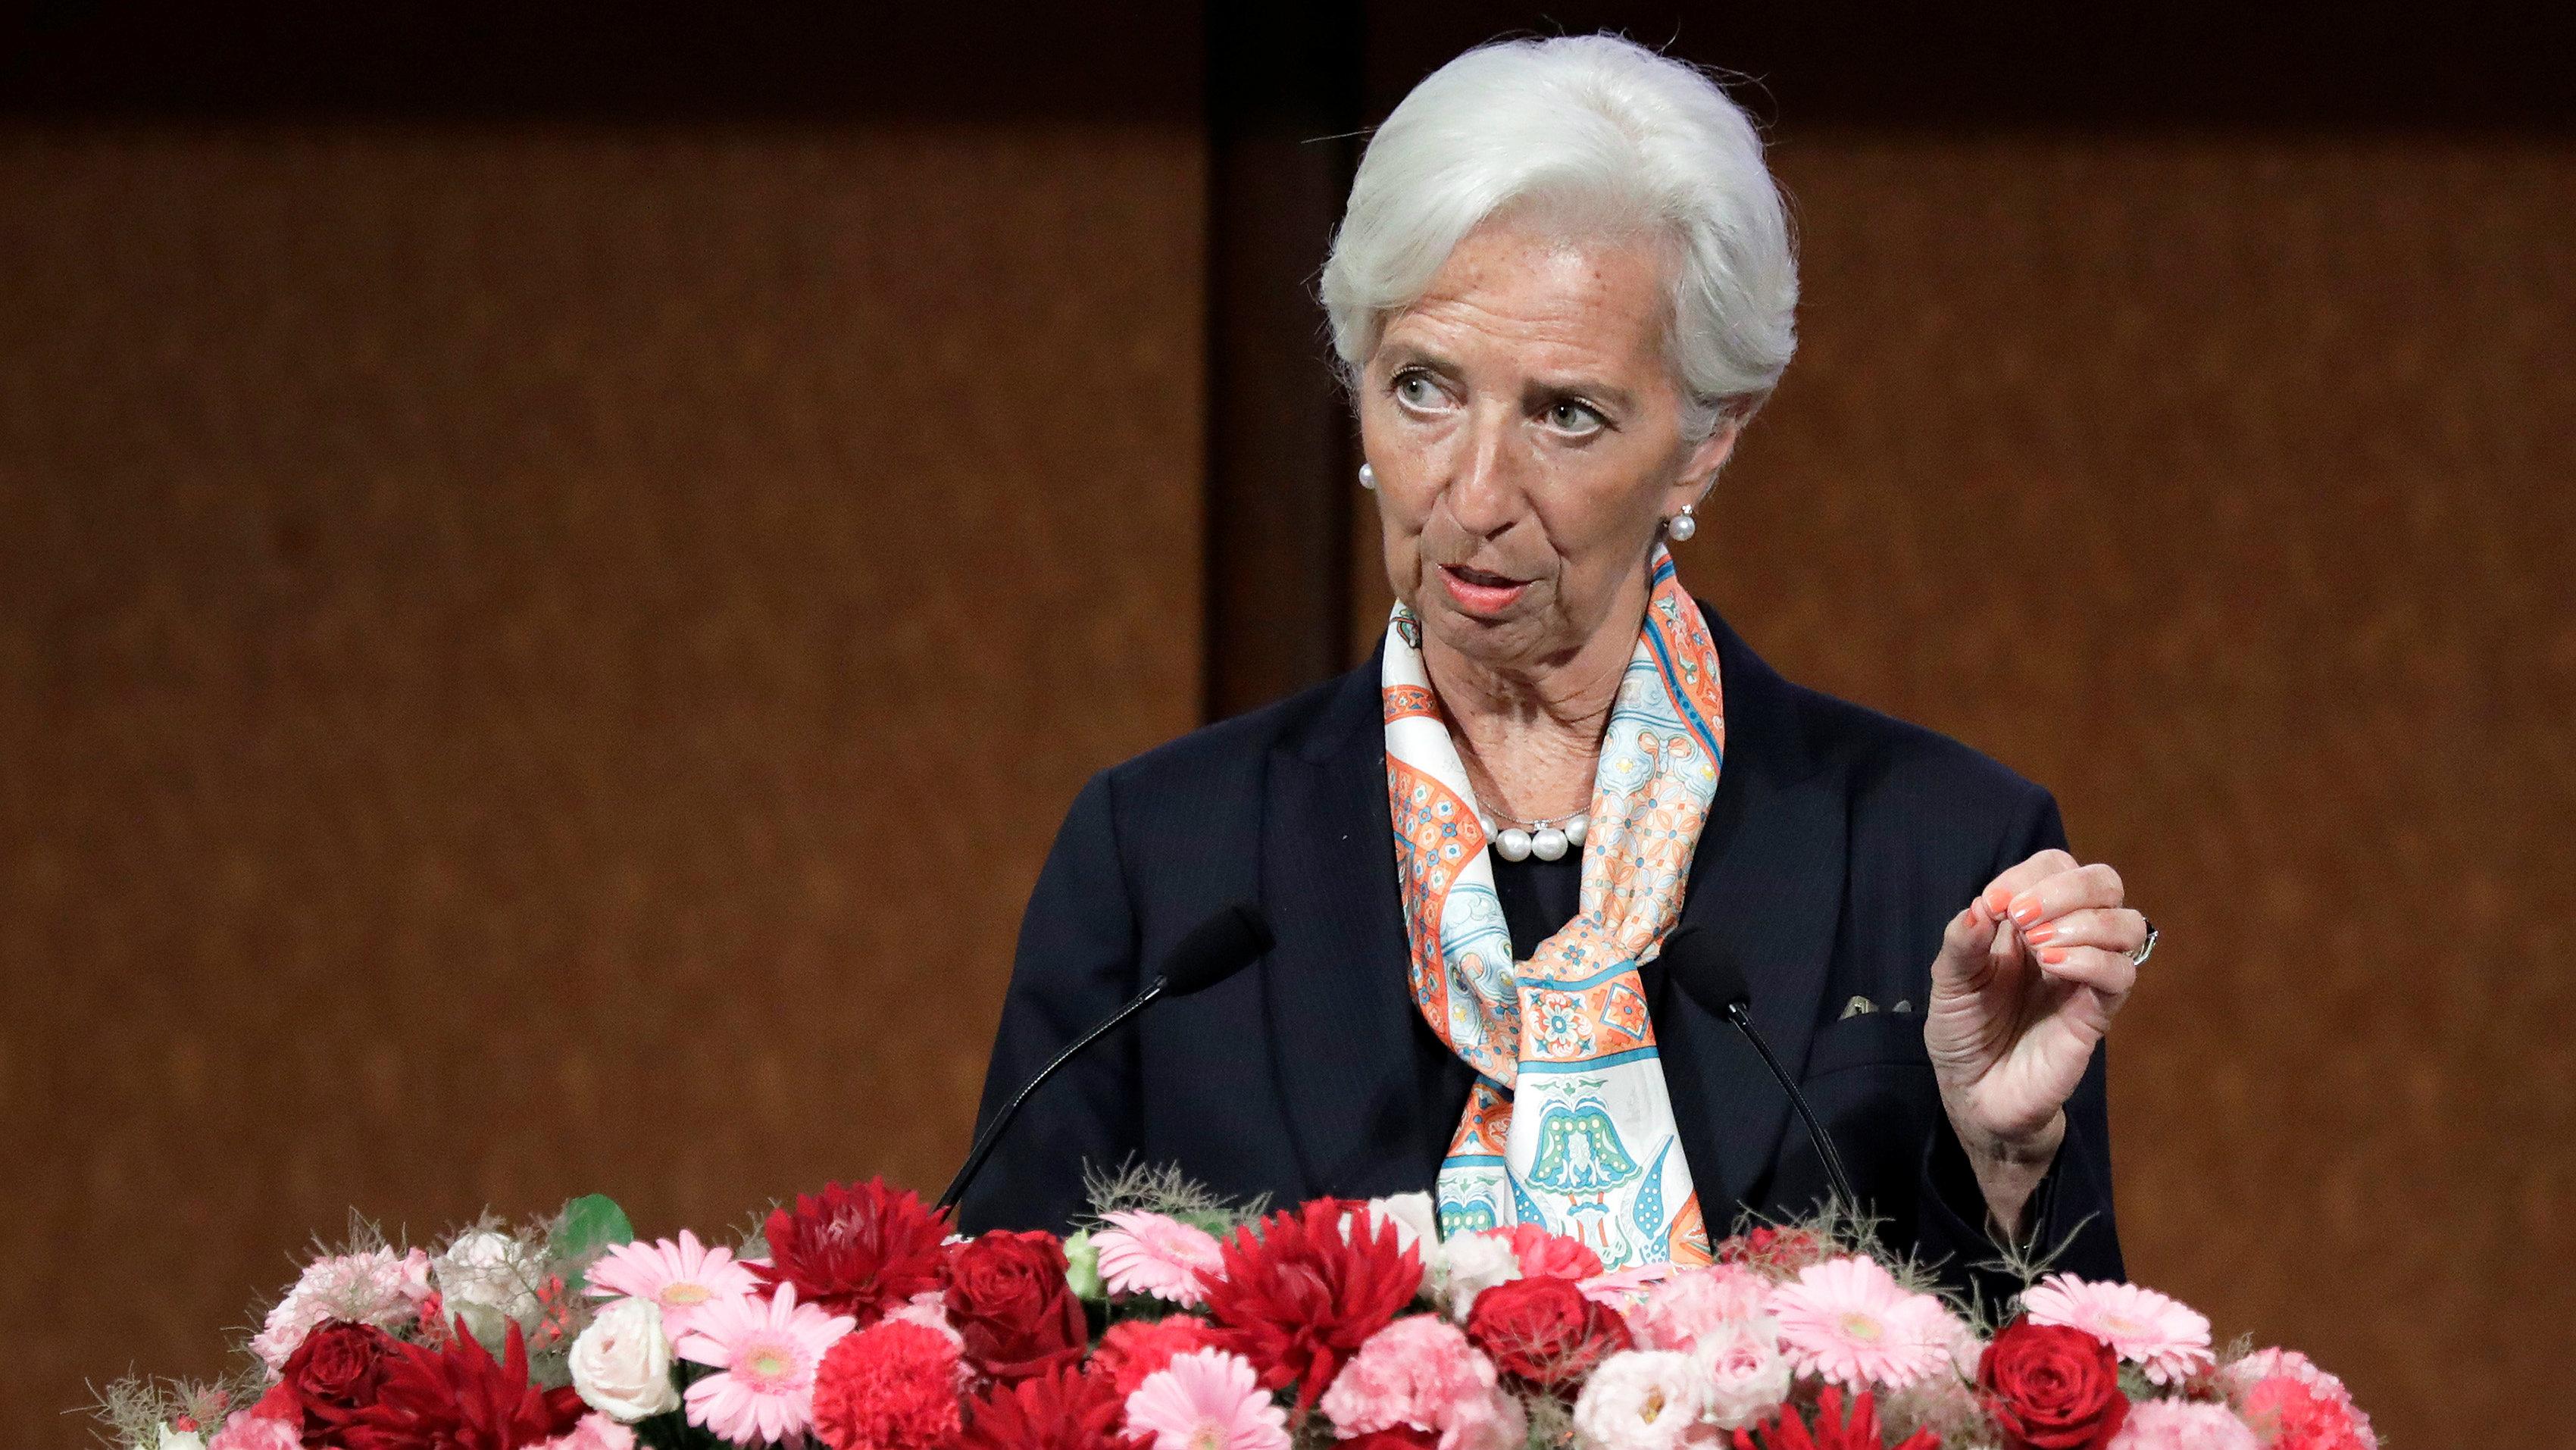 Christine-Lagarde-speech-digital-payments